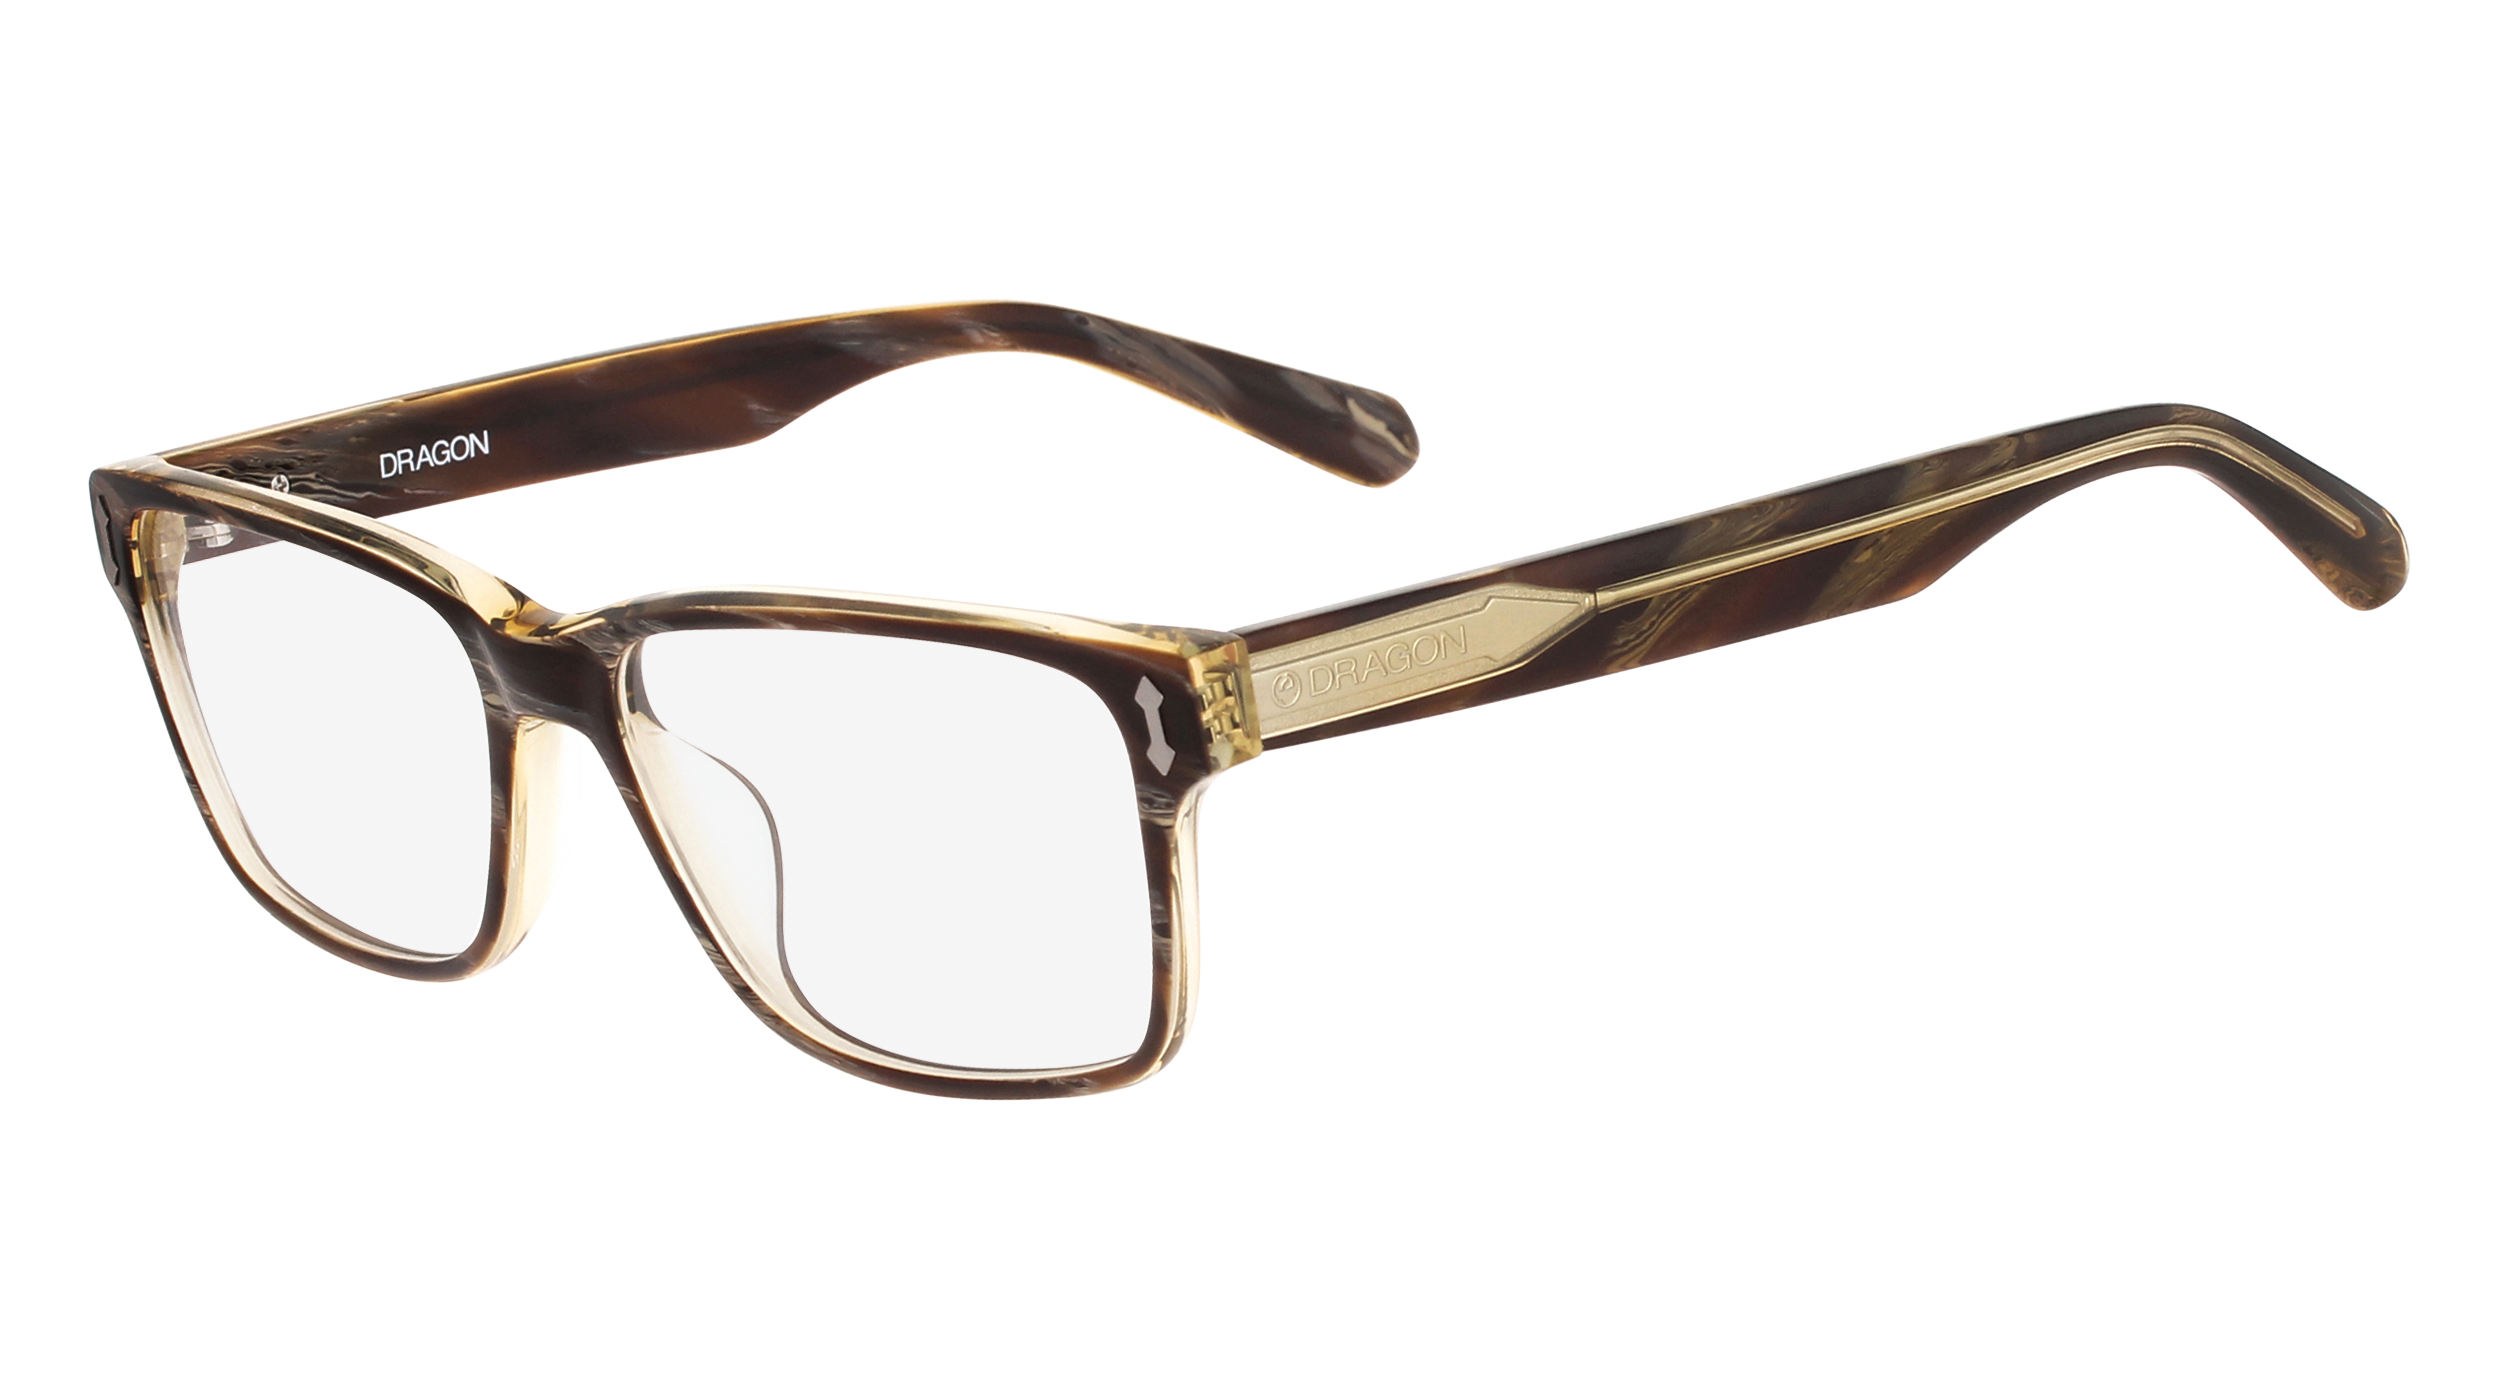 Alliance aviators clipart transparent download Download Eyeglass Alliance, Prescription Dragon Carrera Sunglasses ... transparent download